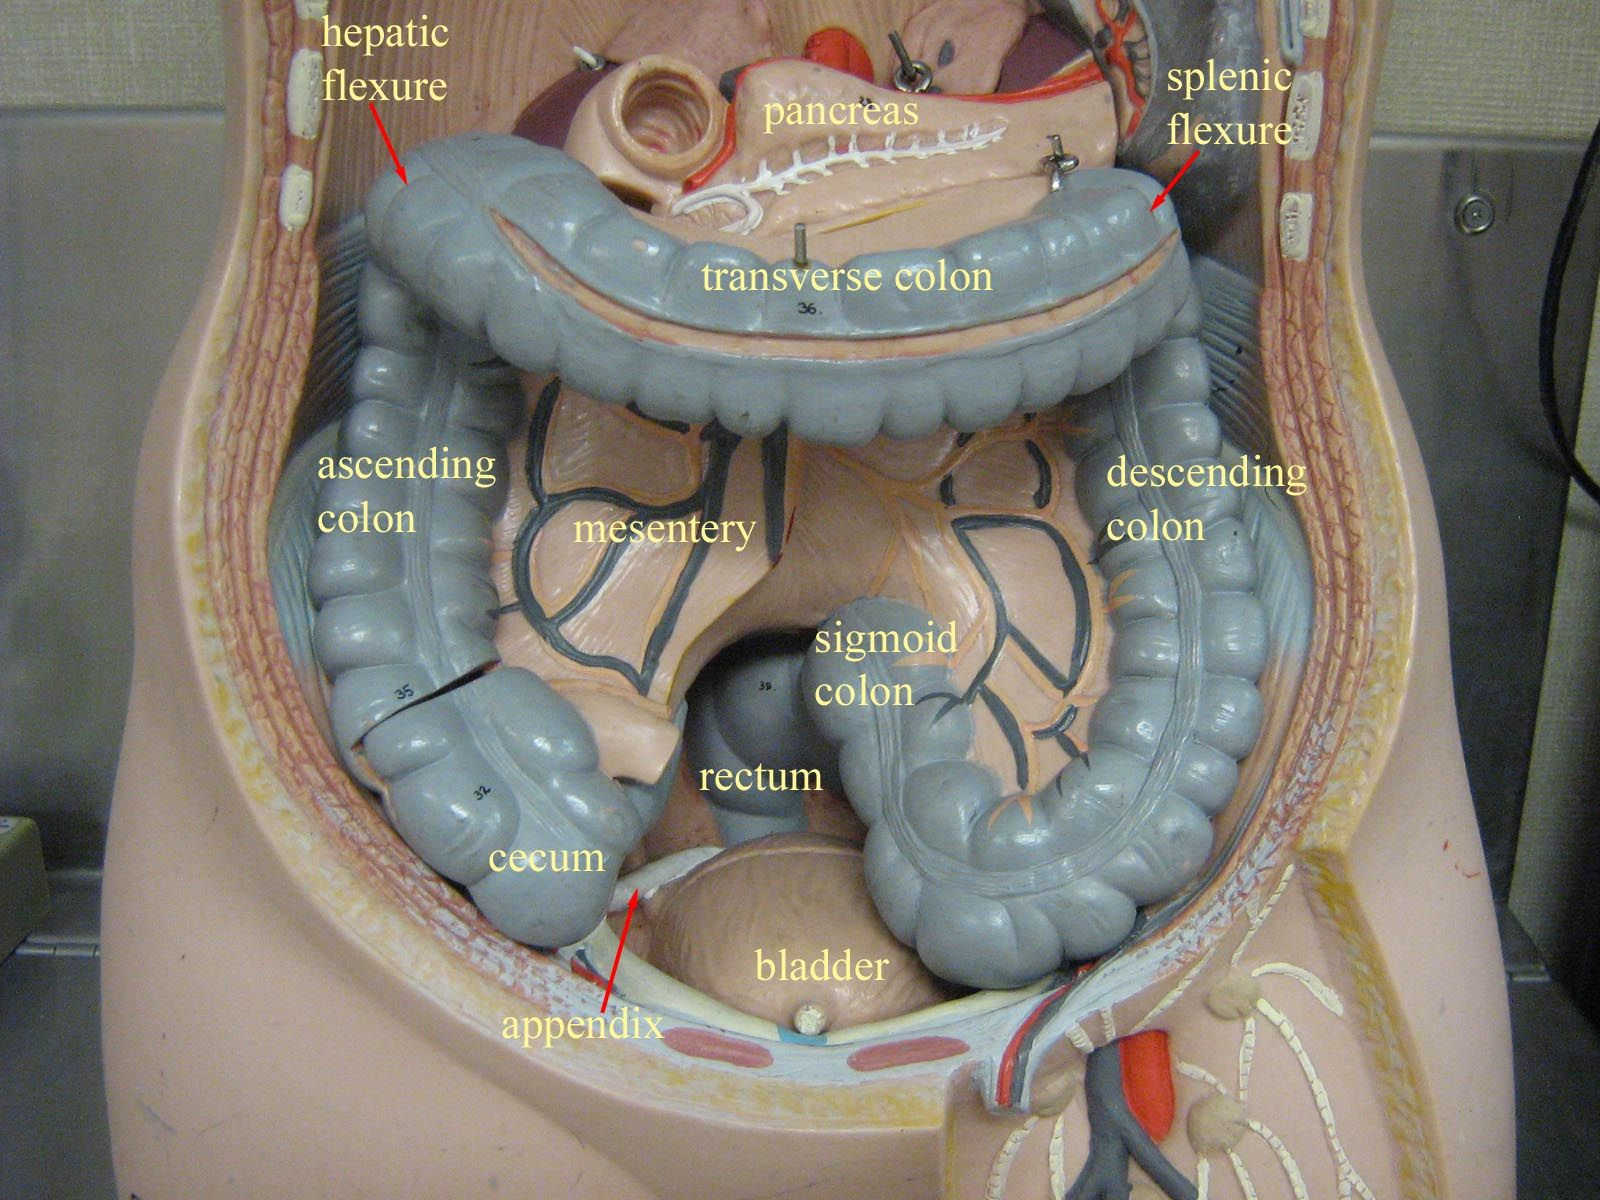 Abdominal Cavity No Liver Stomach Small Intestine